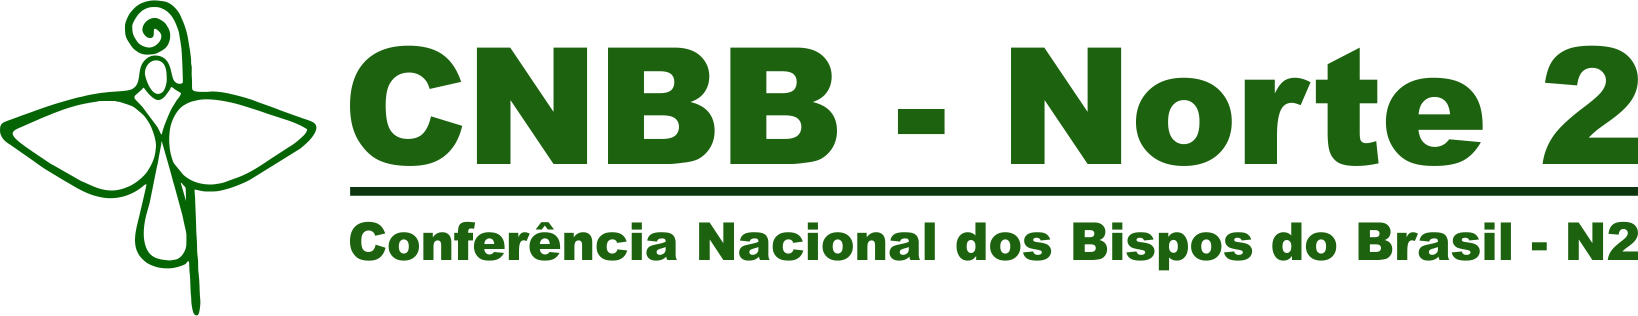 CNBB Norte 2